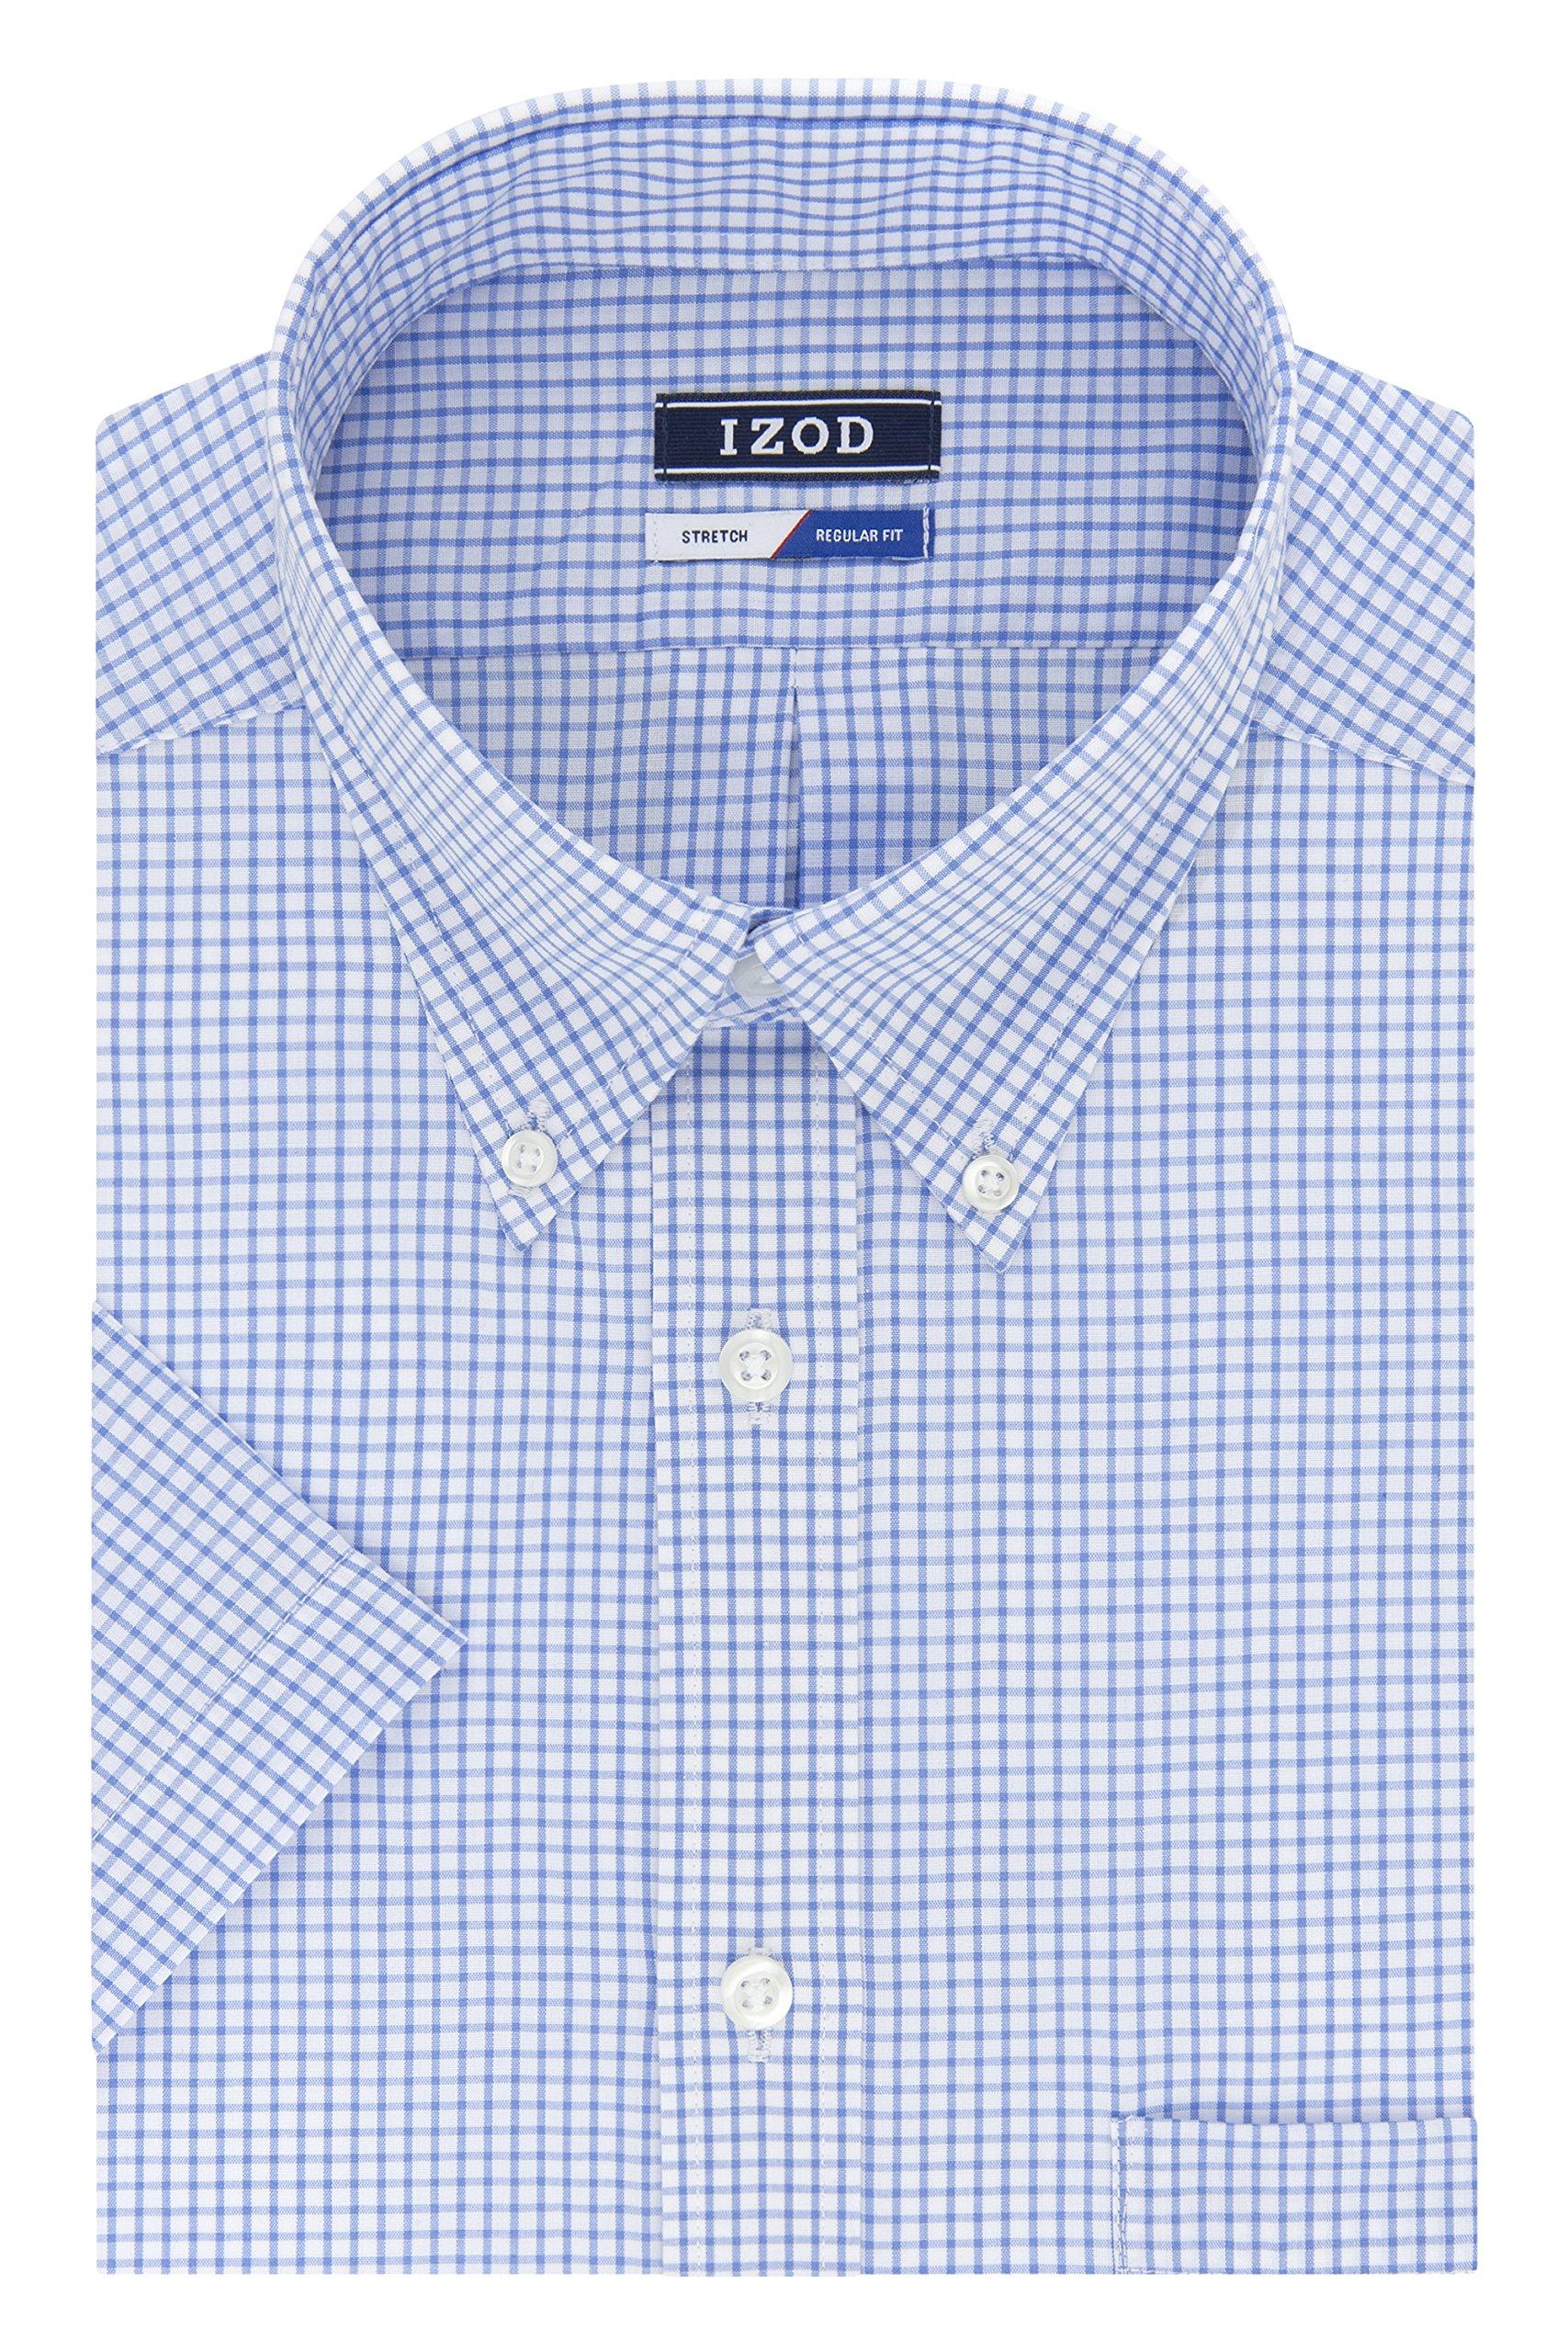 IZOD Men's Regular Fit Short Sleeve Check Dress Shirt, Blue, 18.5'' Neck